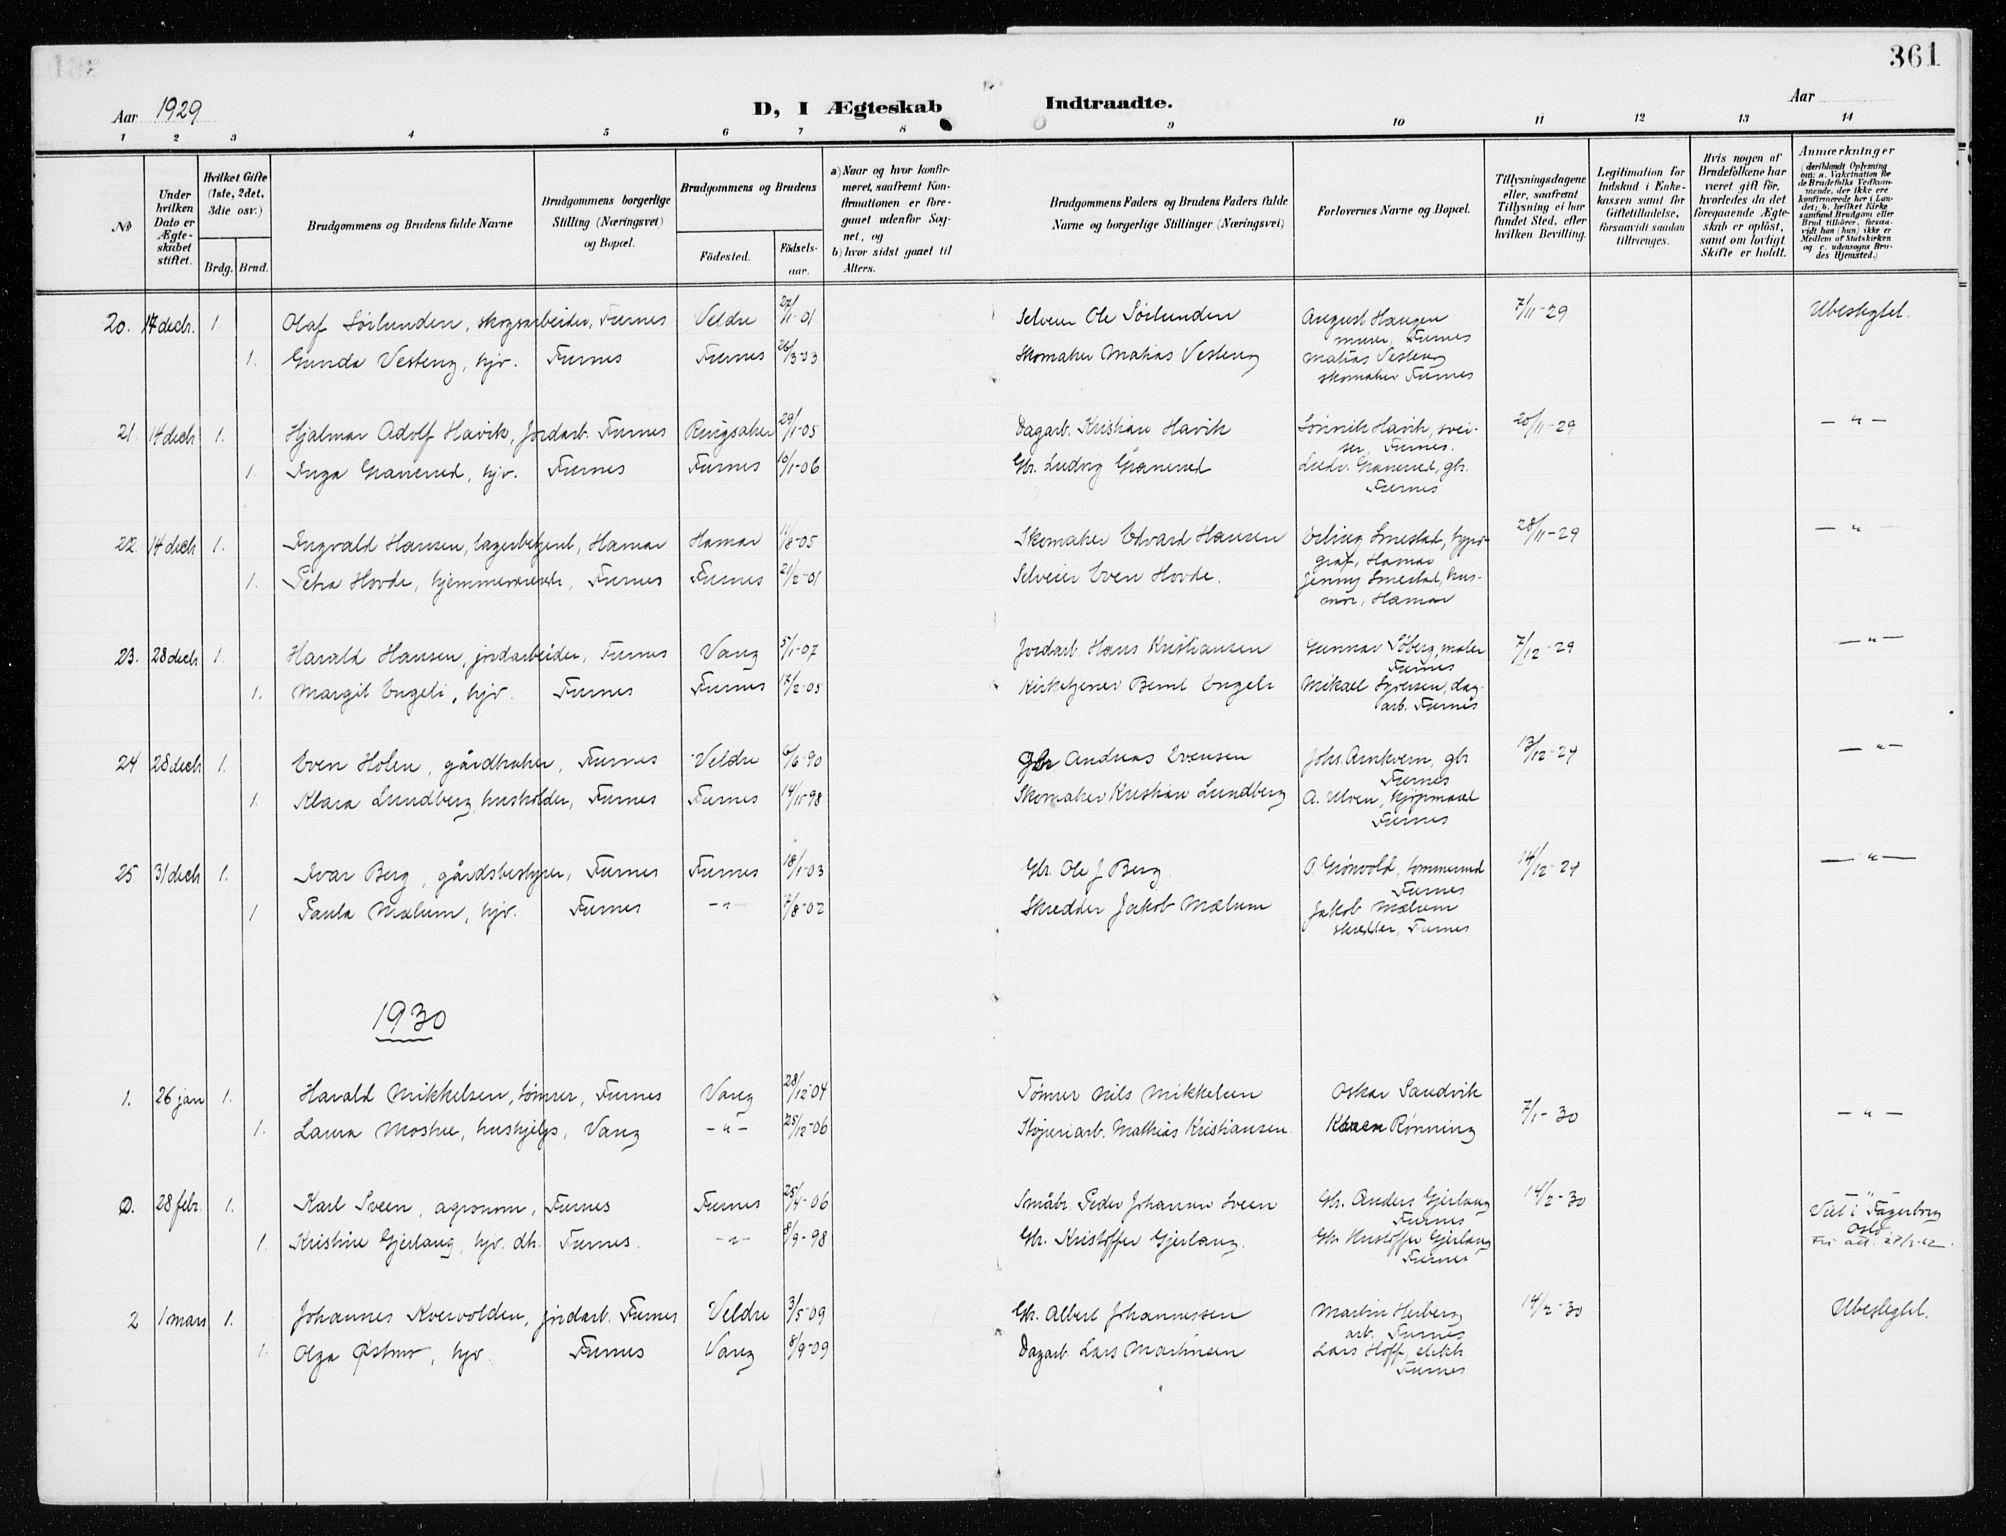 SAH, Furnes prestekontor, K/Ka/L0001: Ministerialbok nr. 1, 1907-1935, s. 361